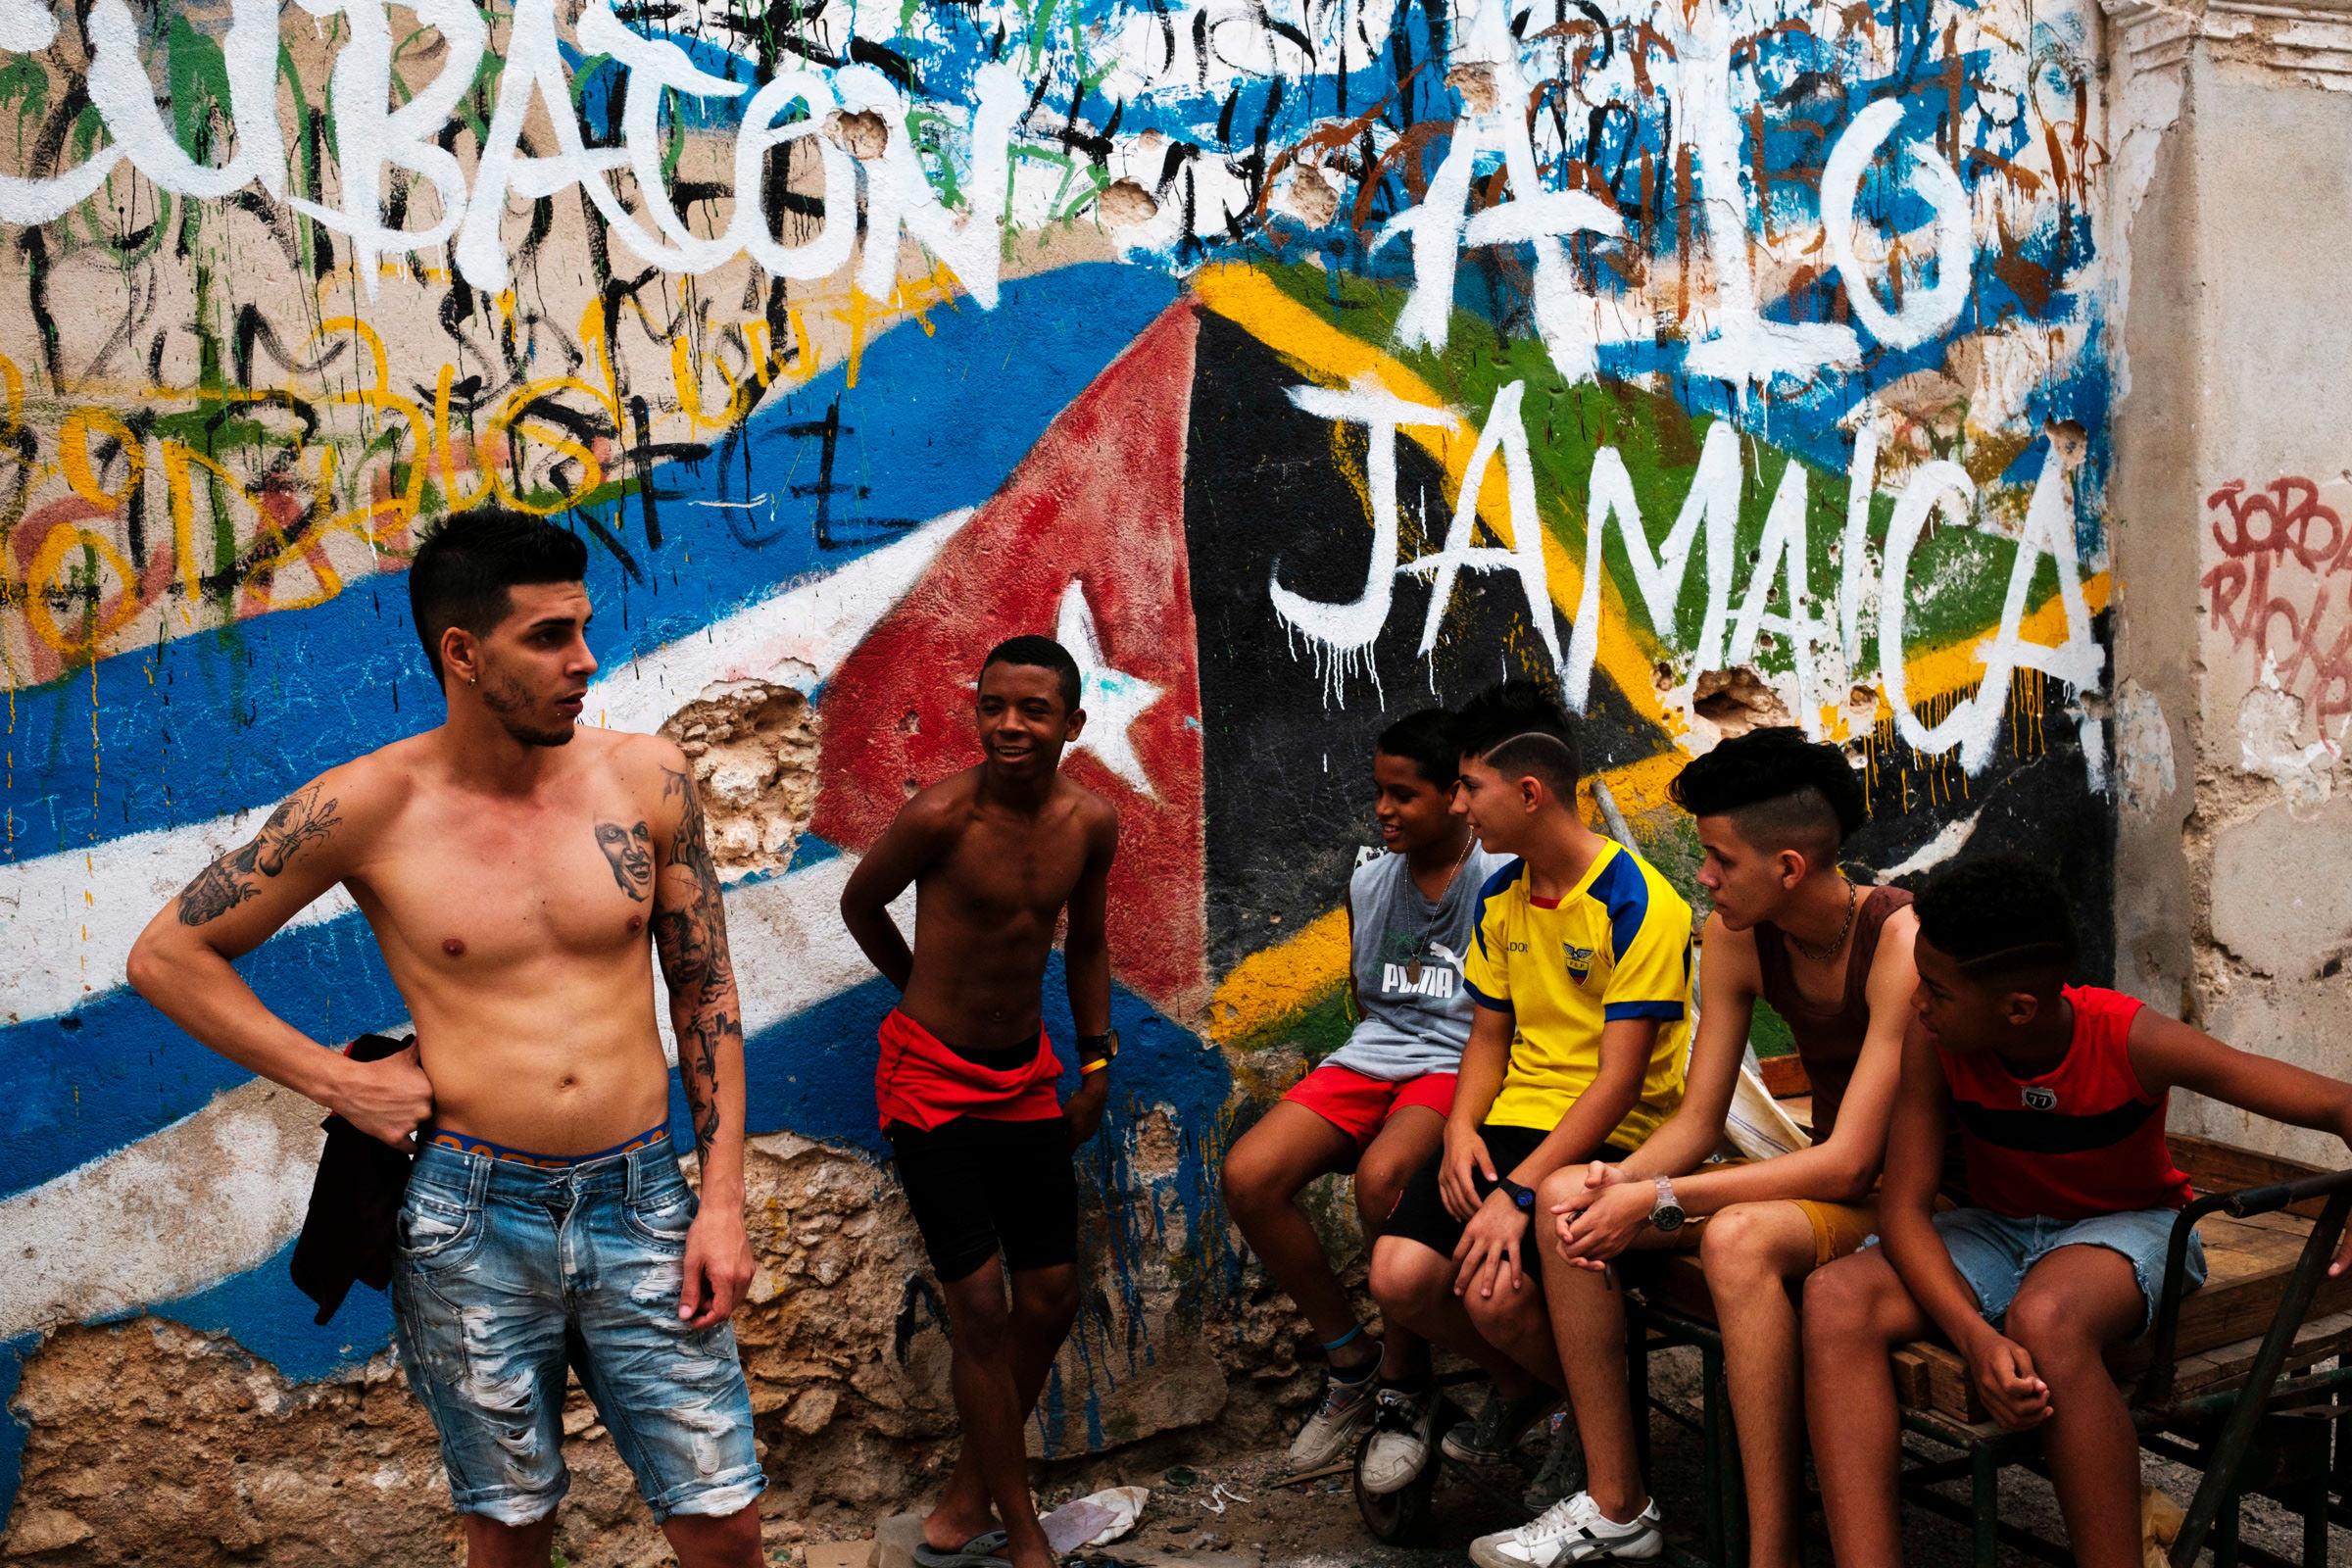 Cuba-Street-Photography-16